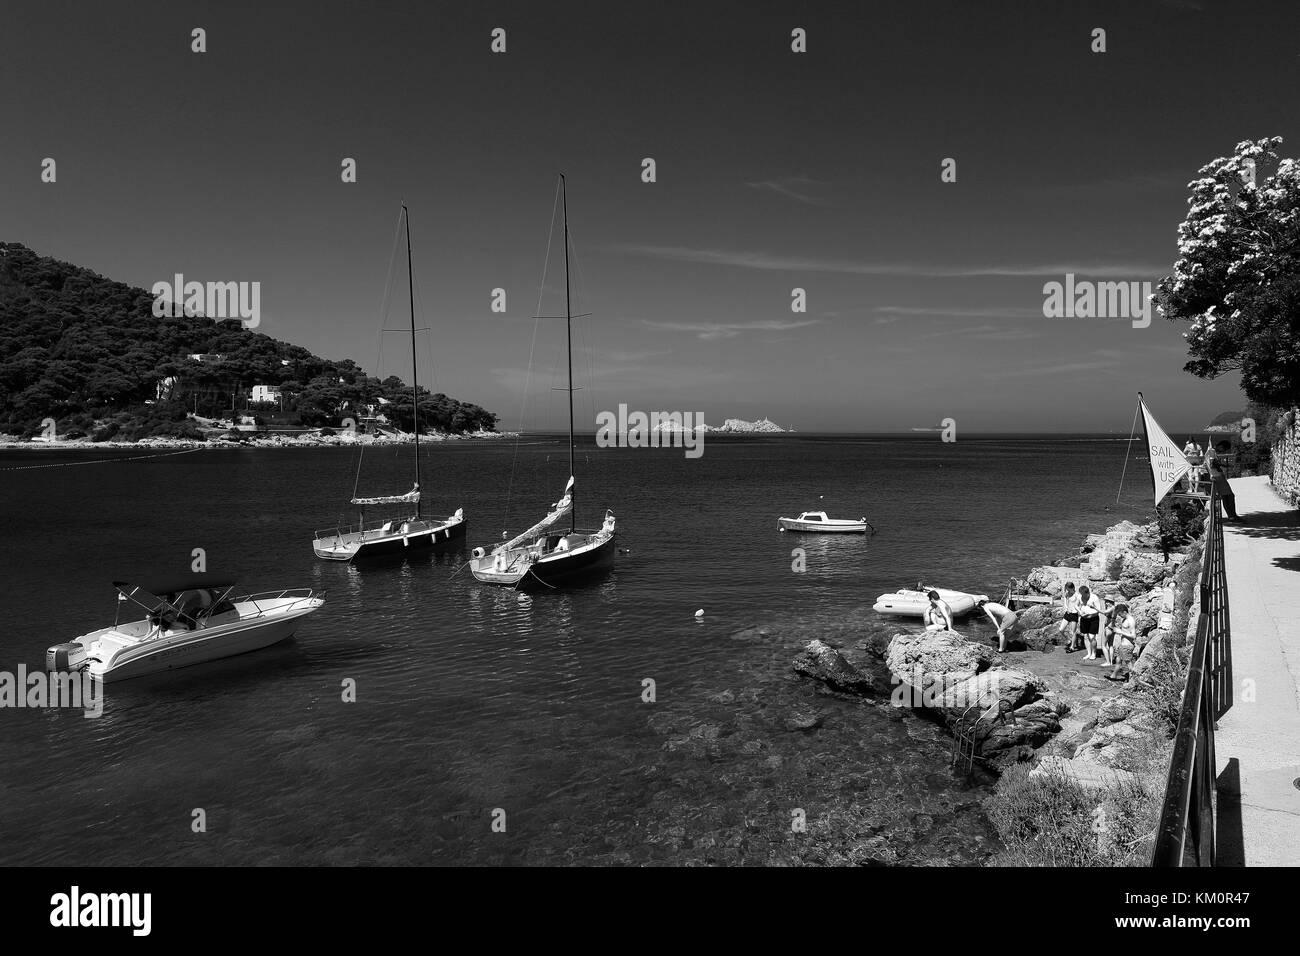 Summer view over Lapad Bay beach, Lapad town, Dubrovnik, Dalmatian coast, Adriatic Sea, Croatia, Europe. - Stock Image